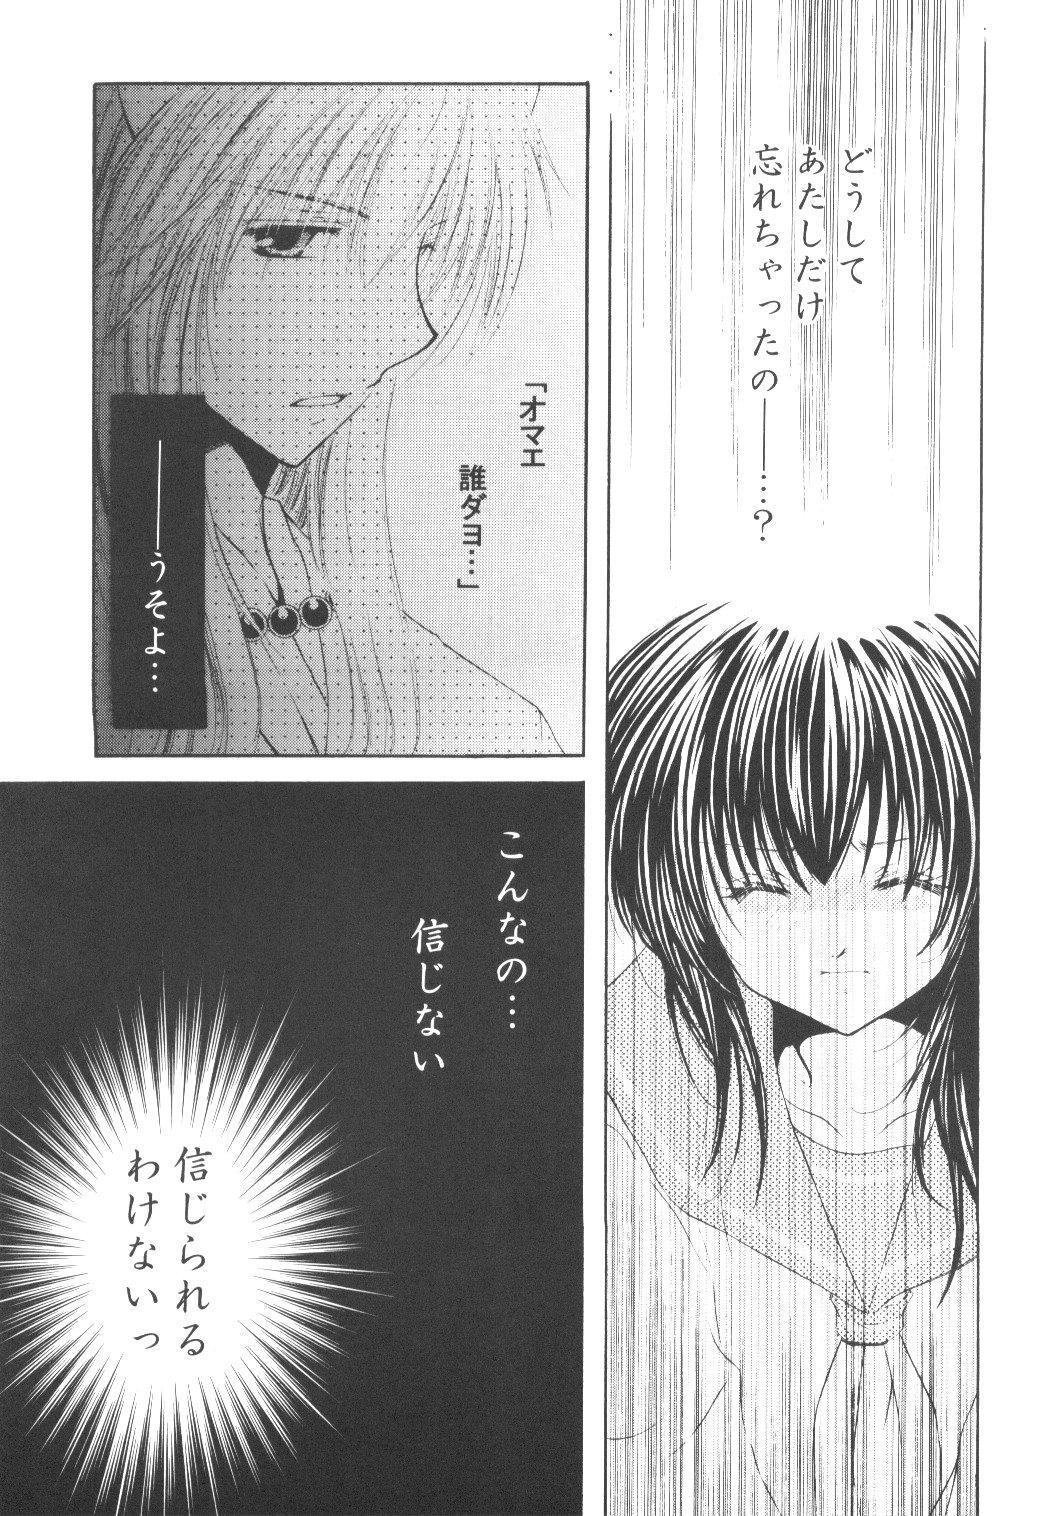 Ryuusei Ryodan 12